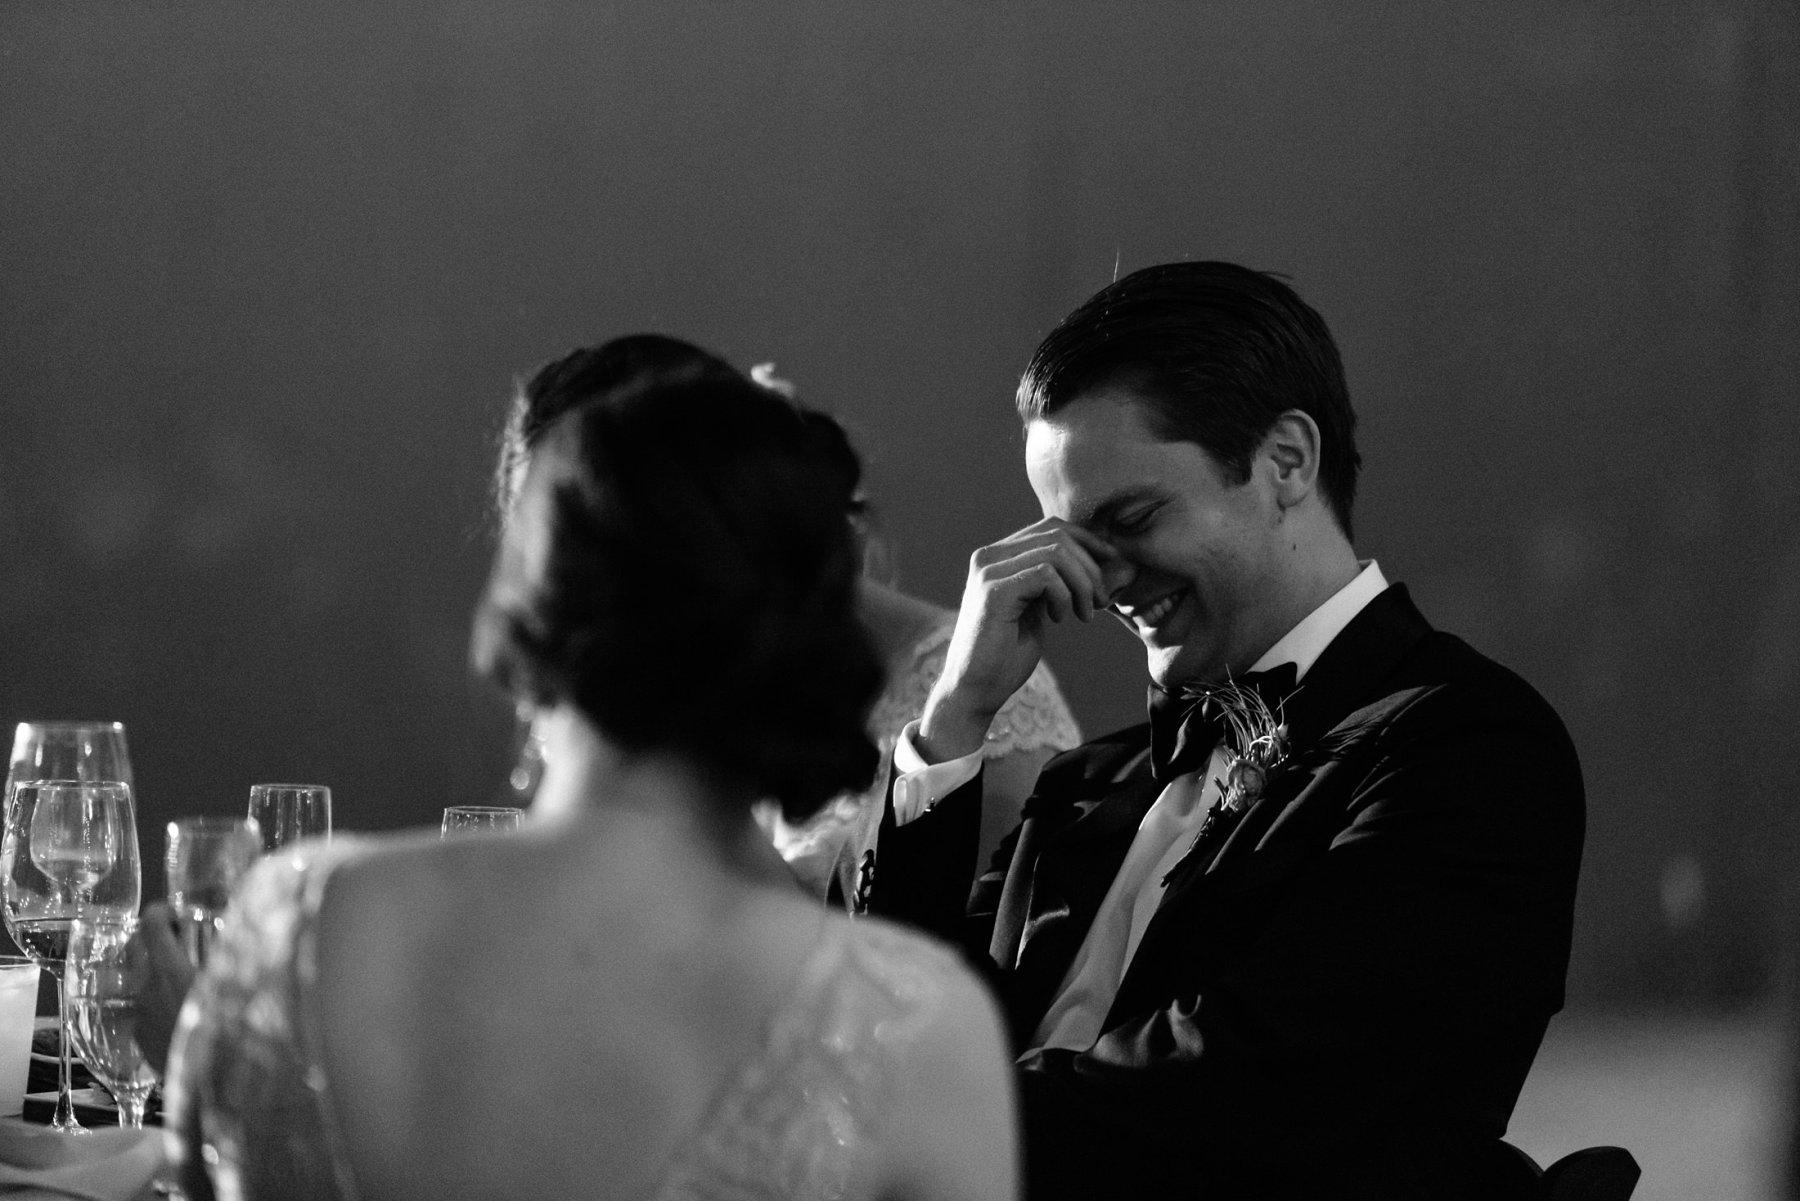 Arizona documentary candid wedding photographer